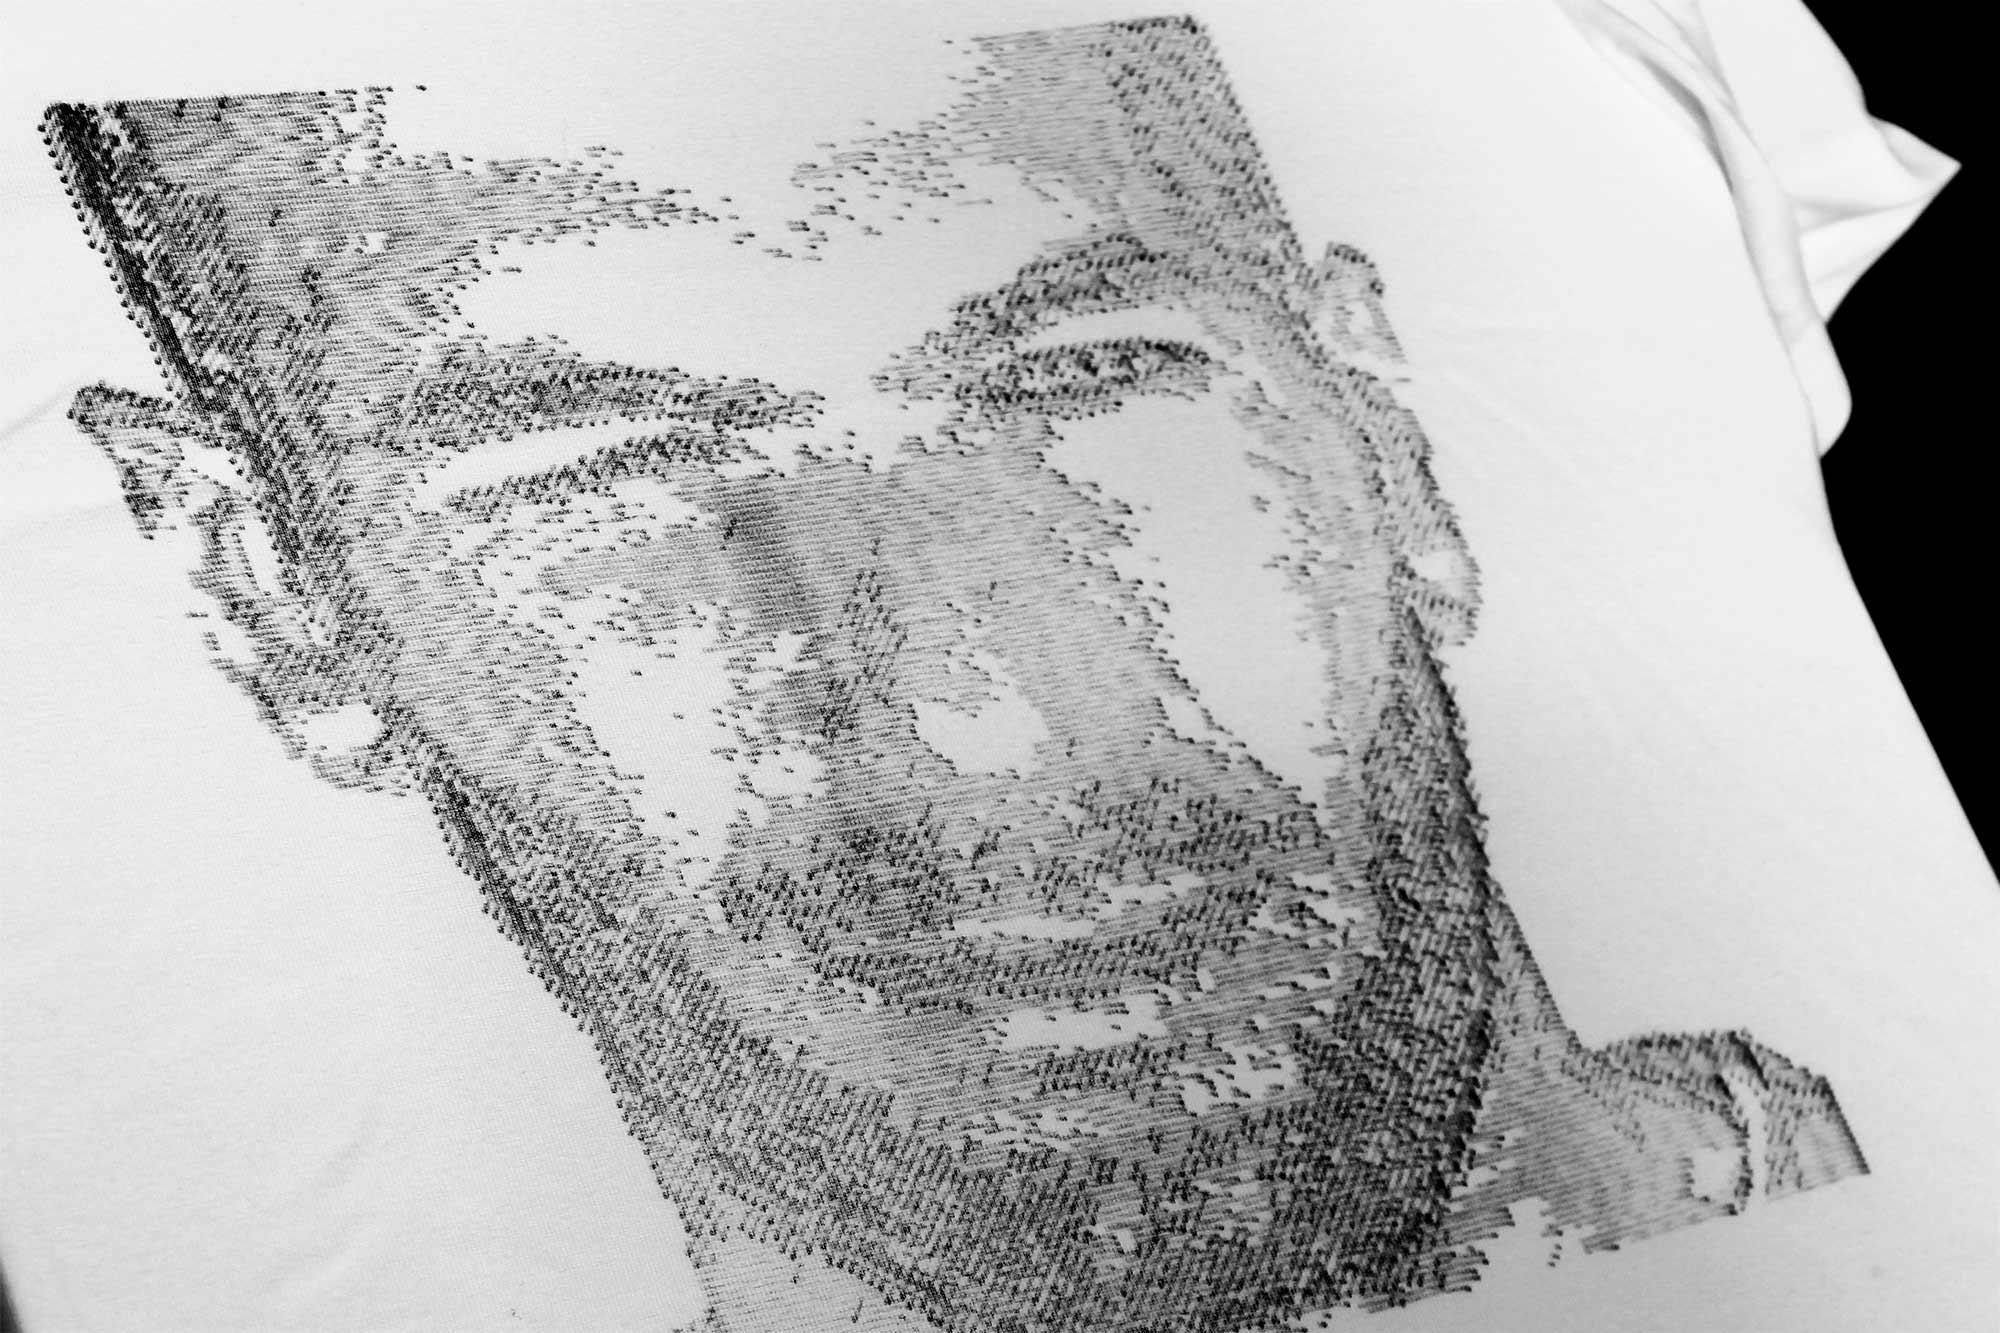 Retratos-Robots_-A_-techlab-_-EXarchitects_09